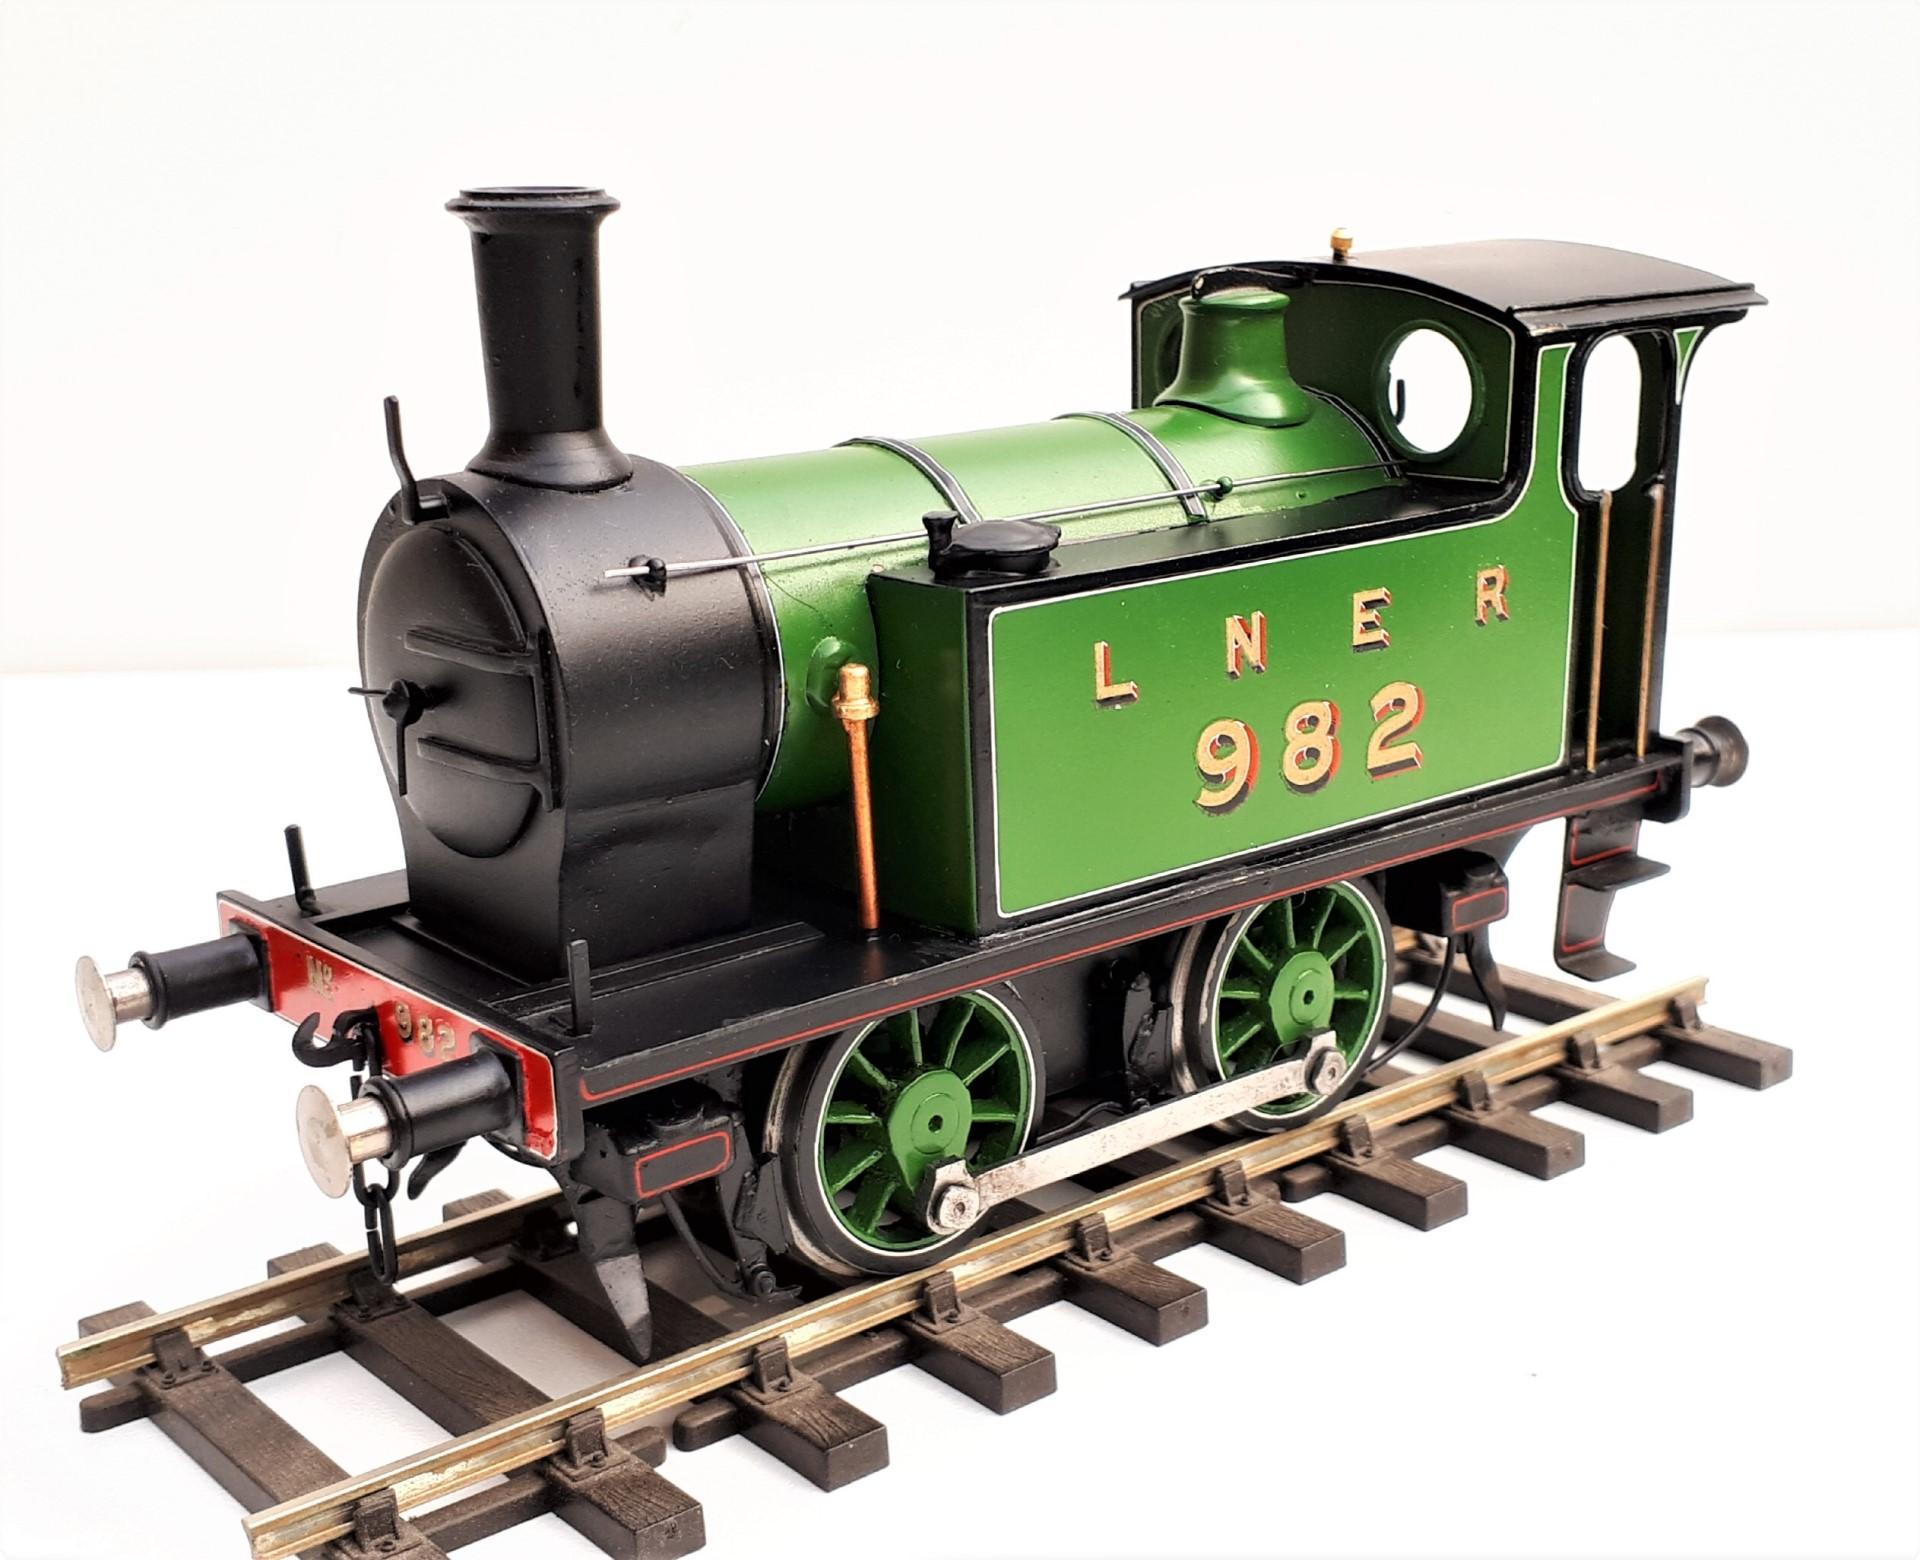 LNER no. 982